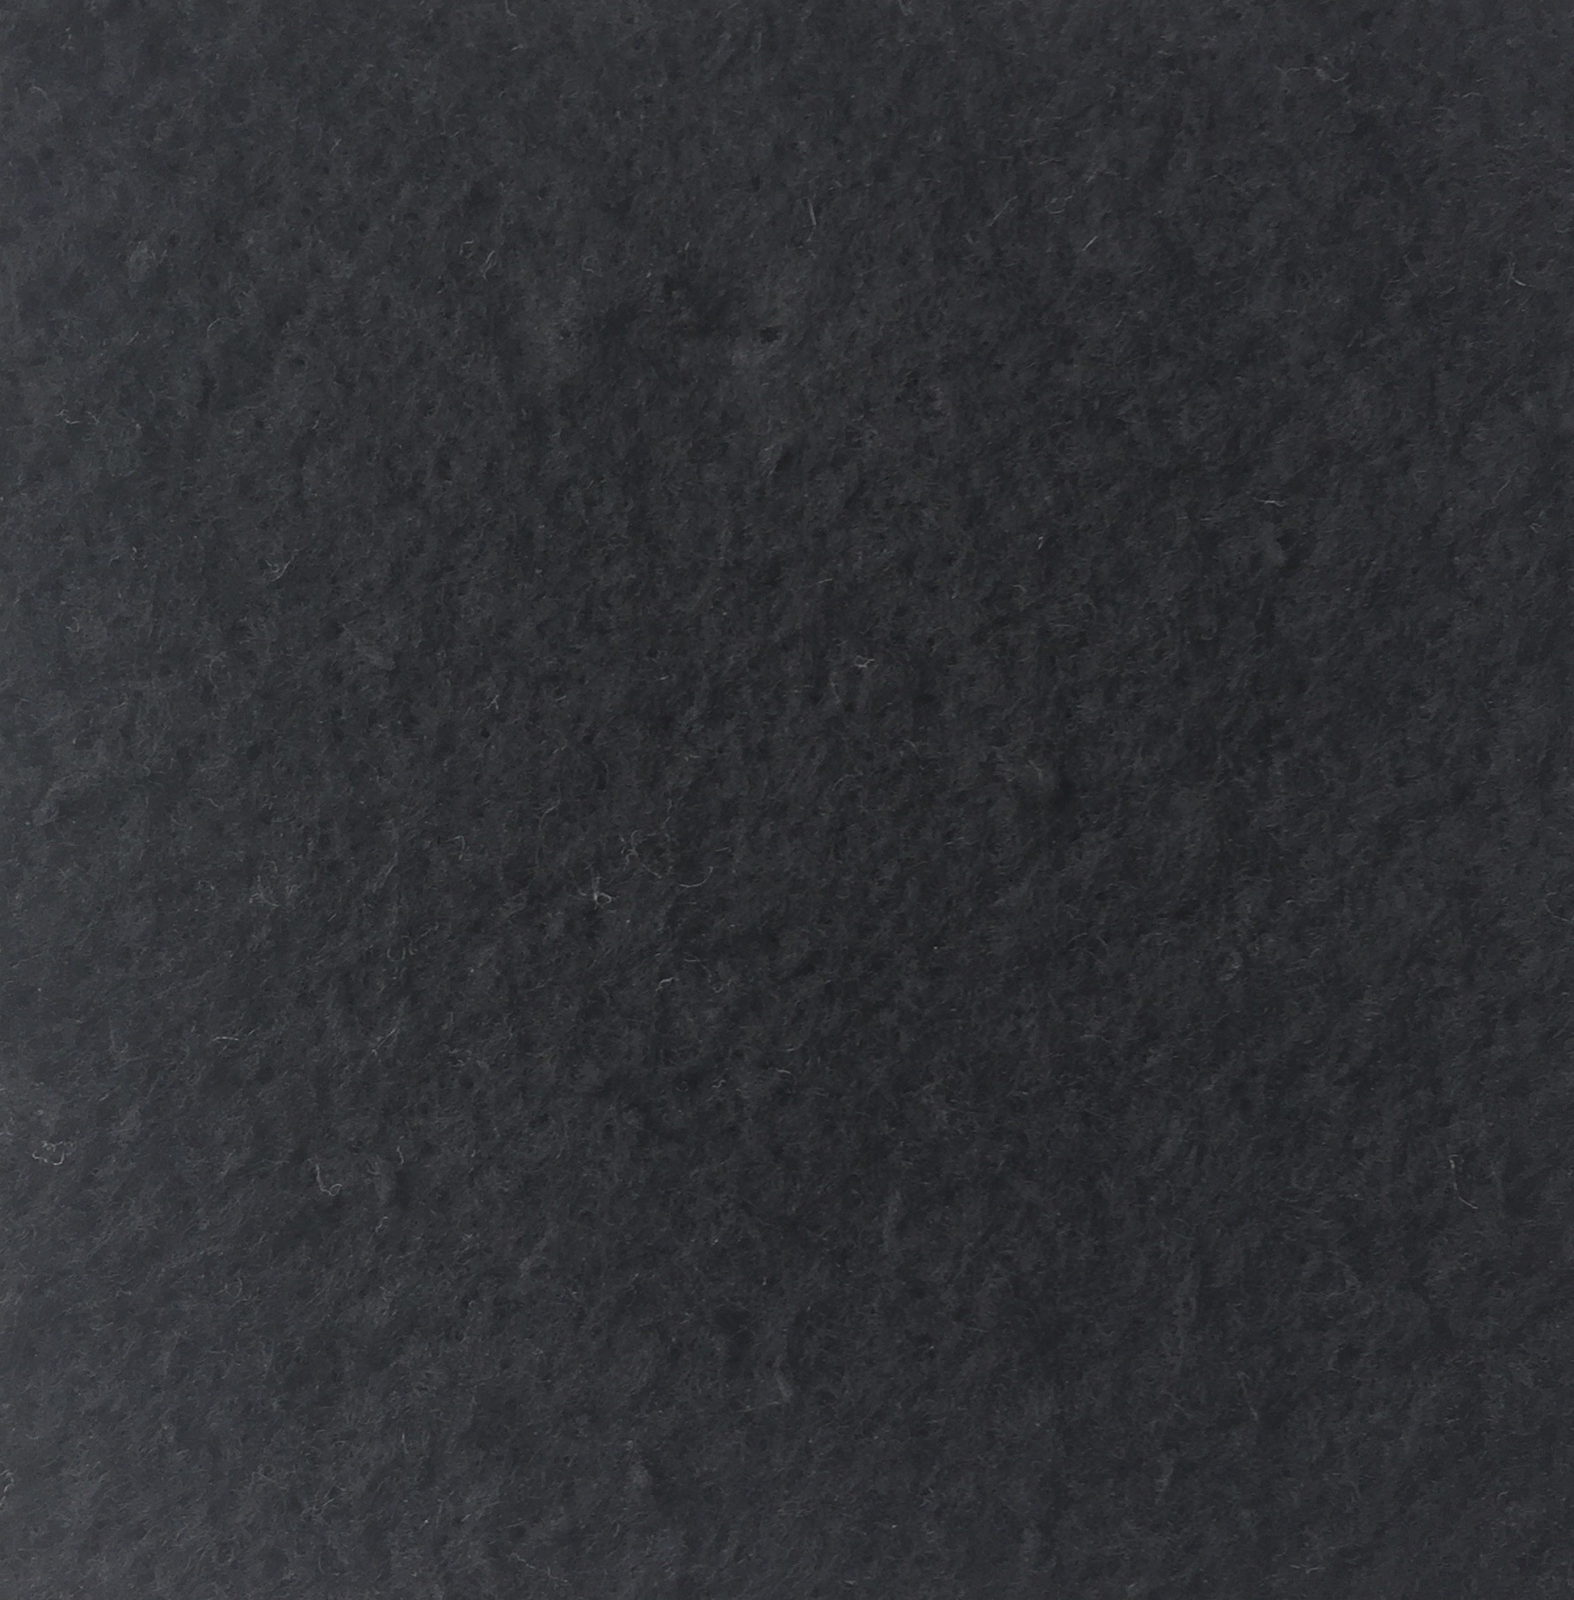 Hobbs 80/20 Black Cotton Blend 108 - By the Yard